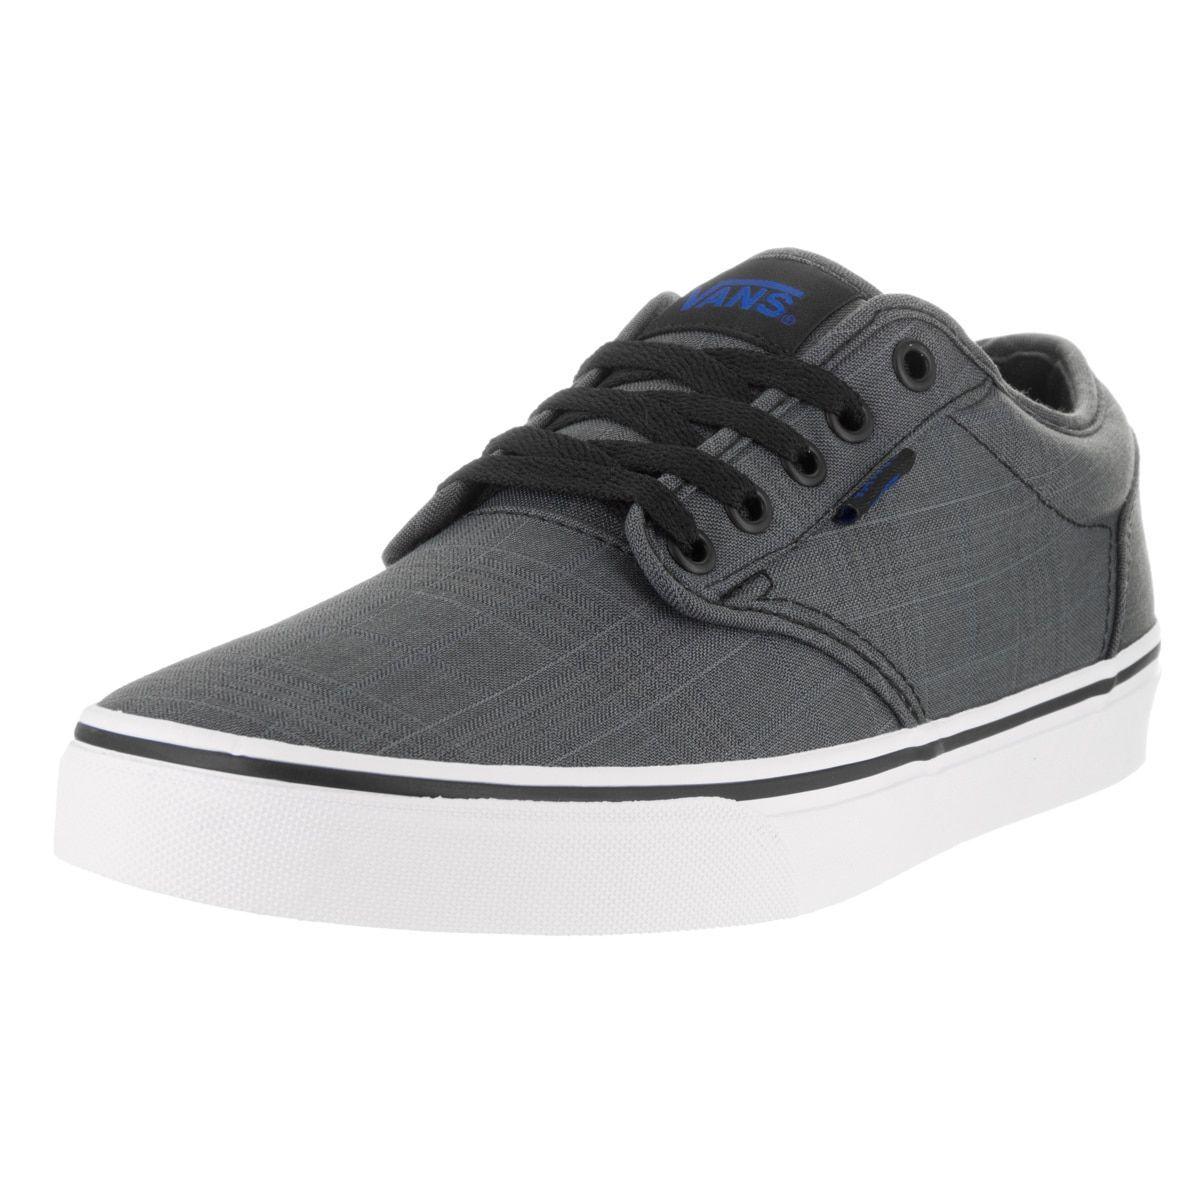 vans men's atwood textile sneakers